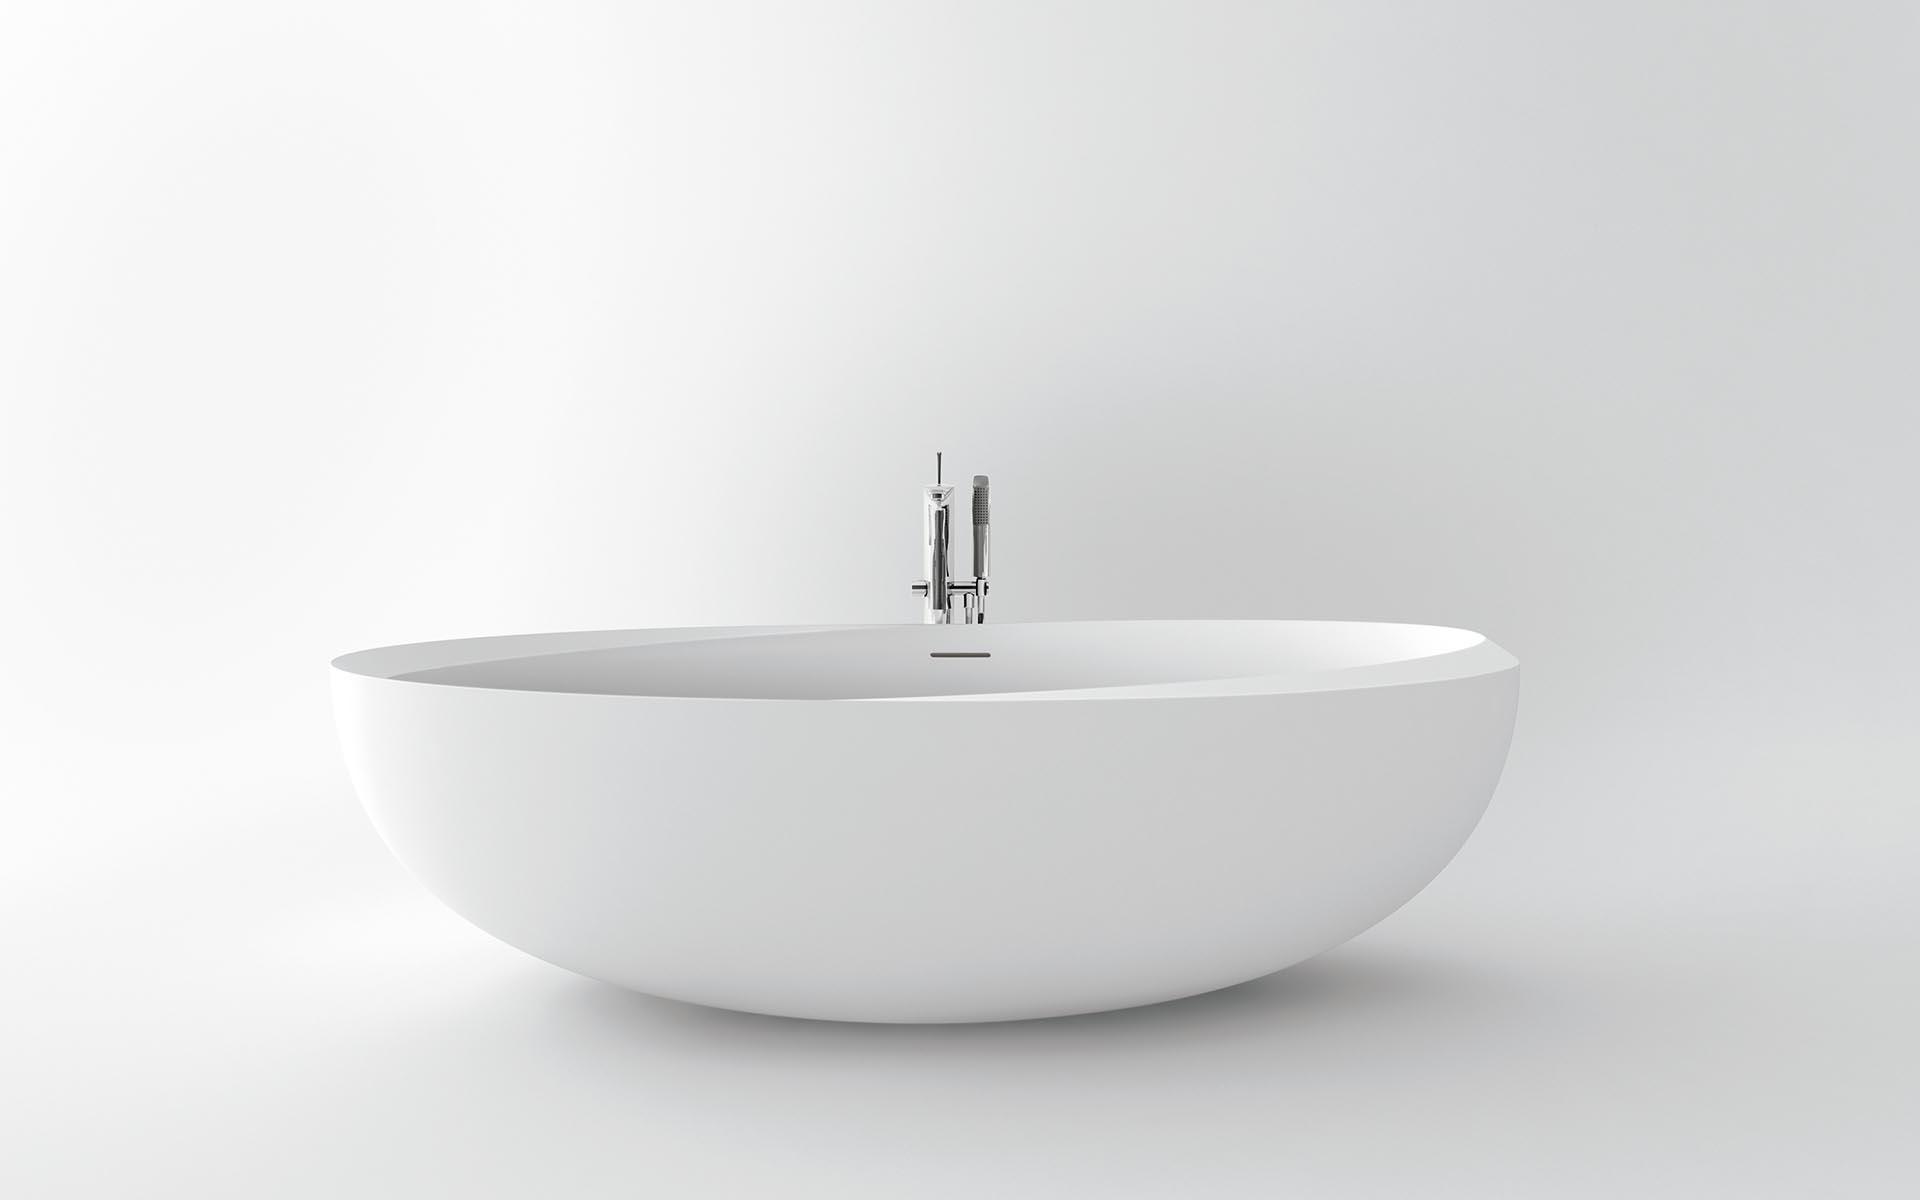 bañera sin bordes, redonda